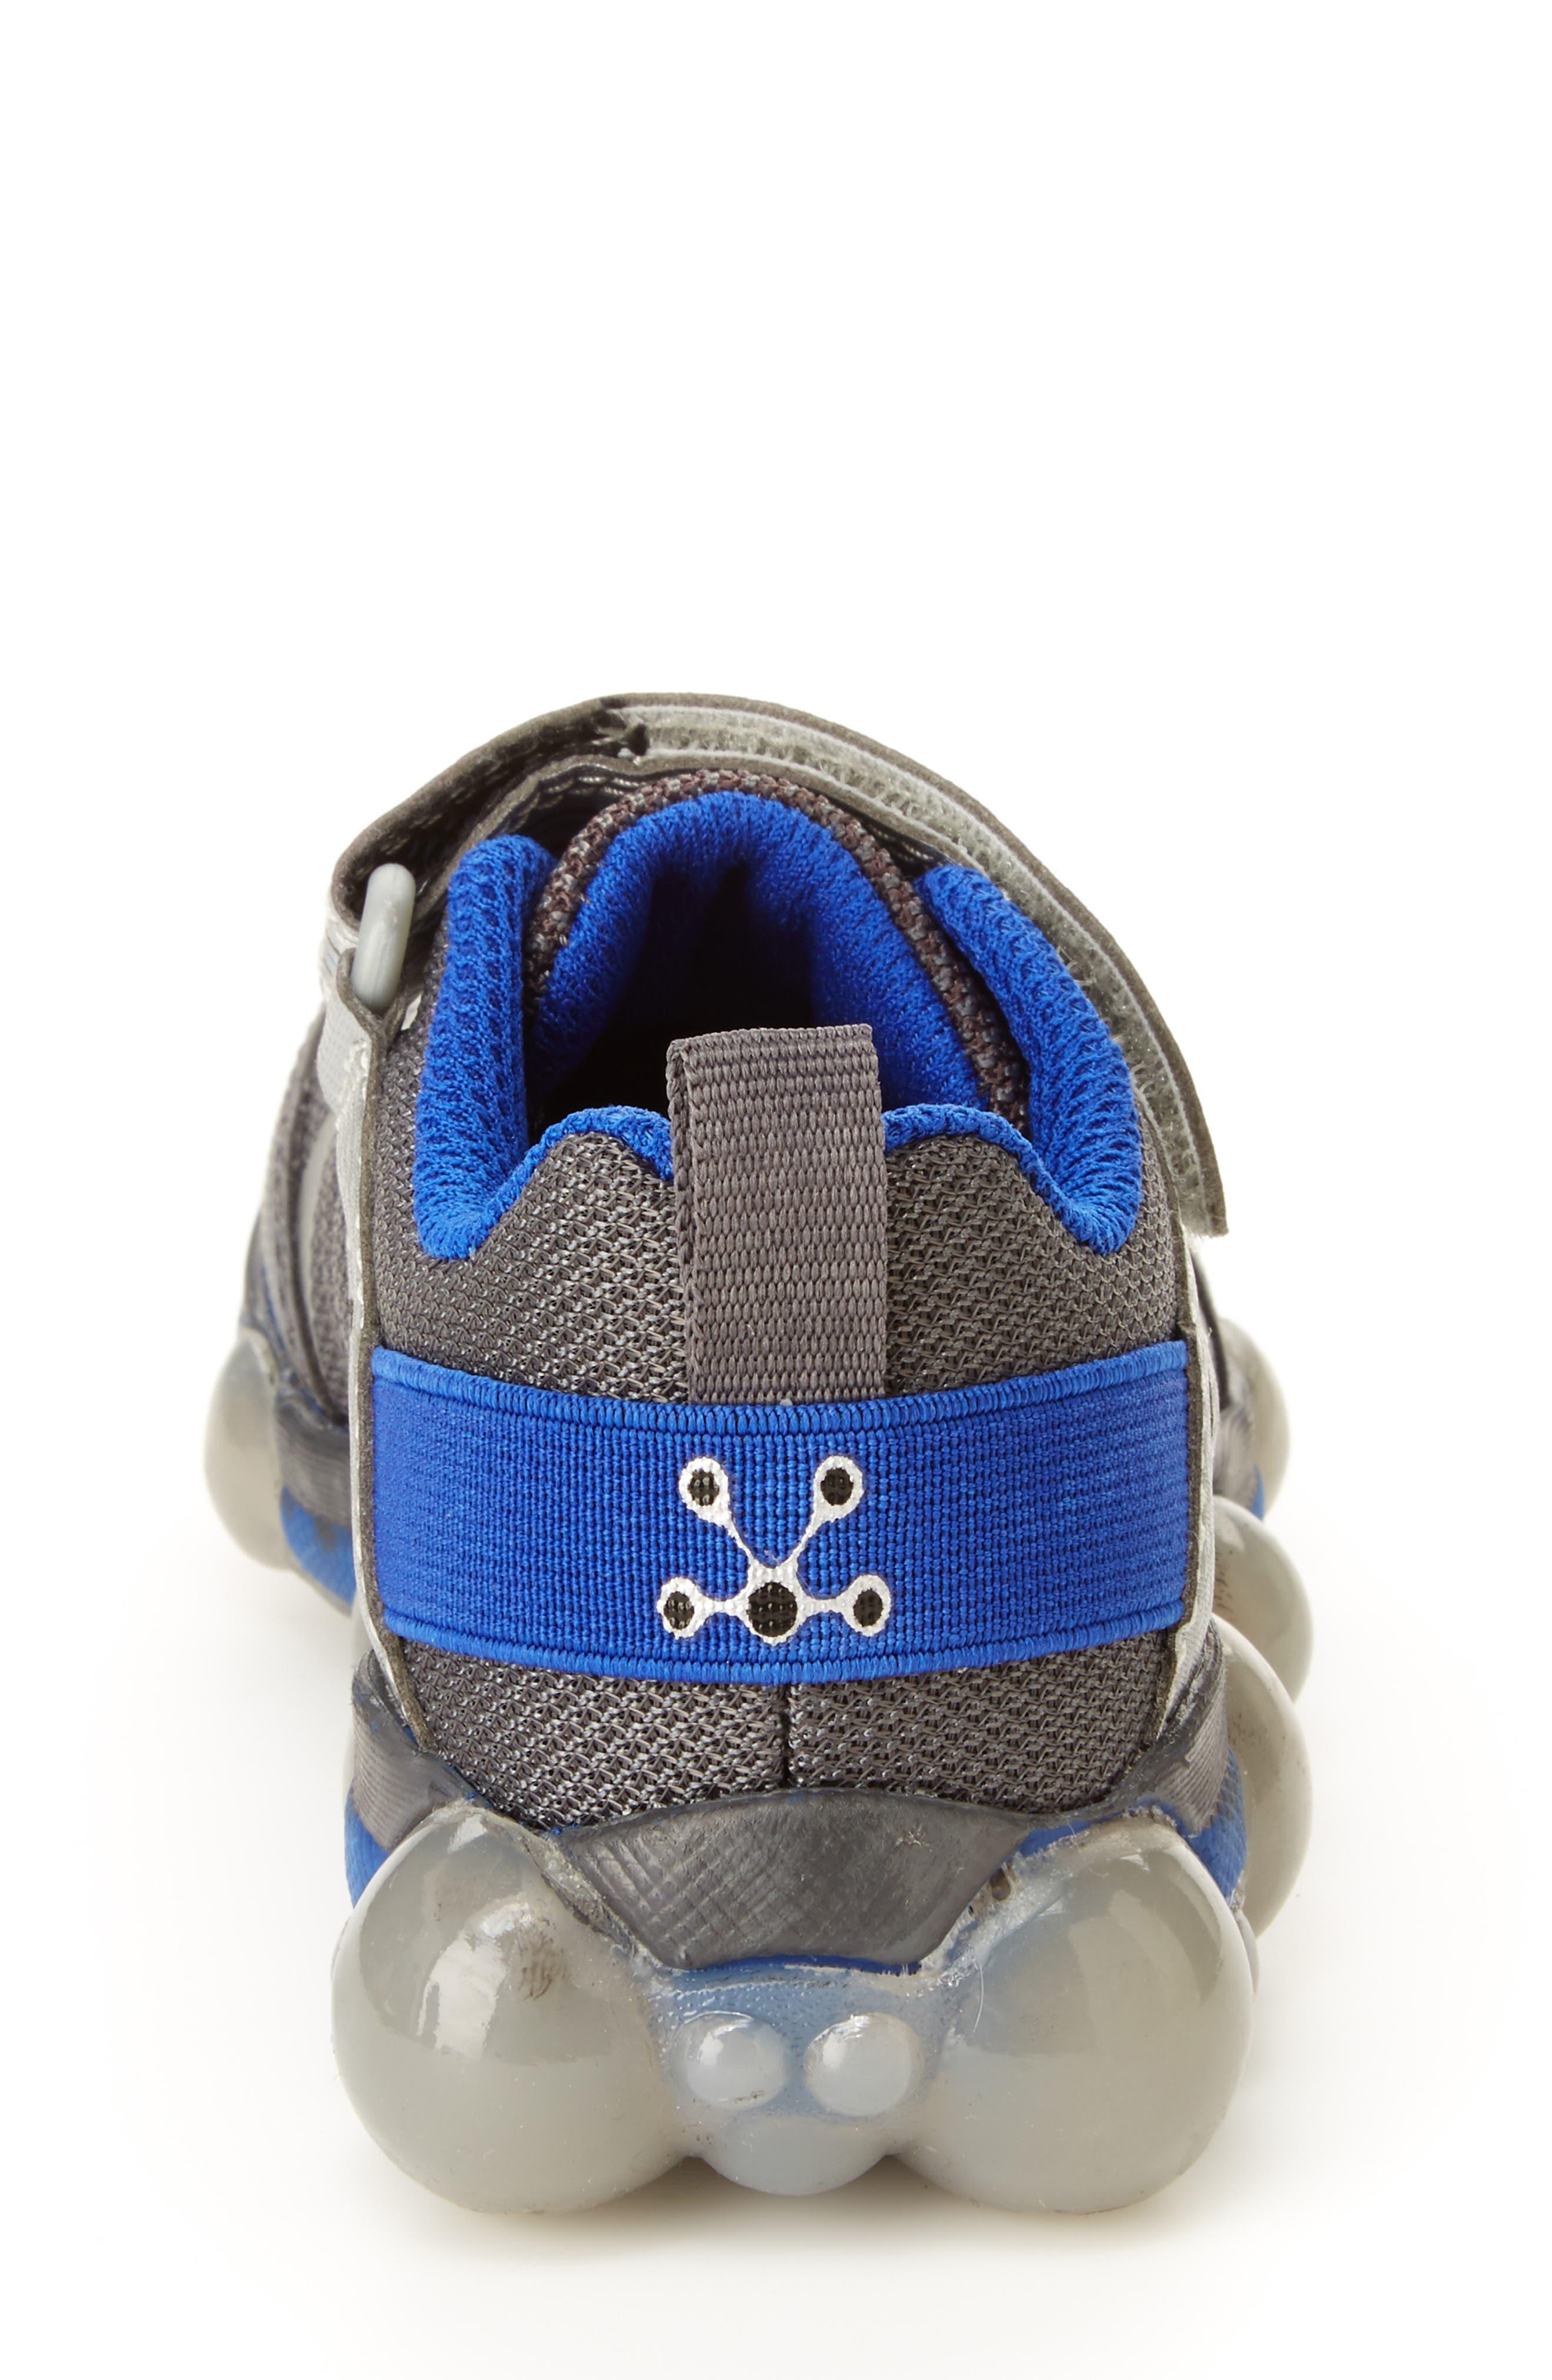 Leepz 3.0 Light-Up Sneaker,                             Alternate thumbnail 6, color,                             DARK GREY/ BLUE